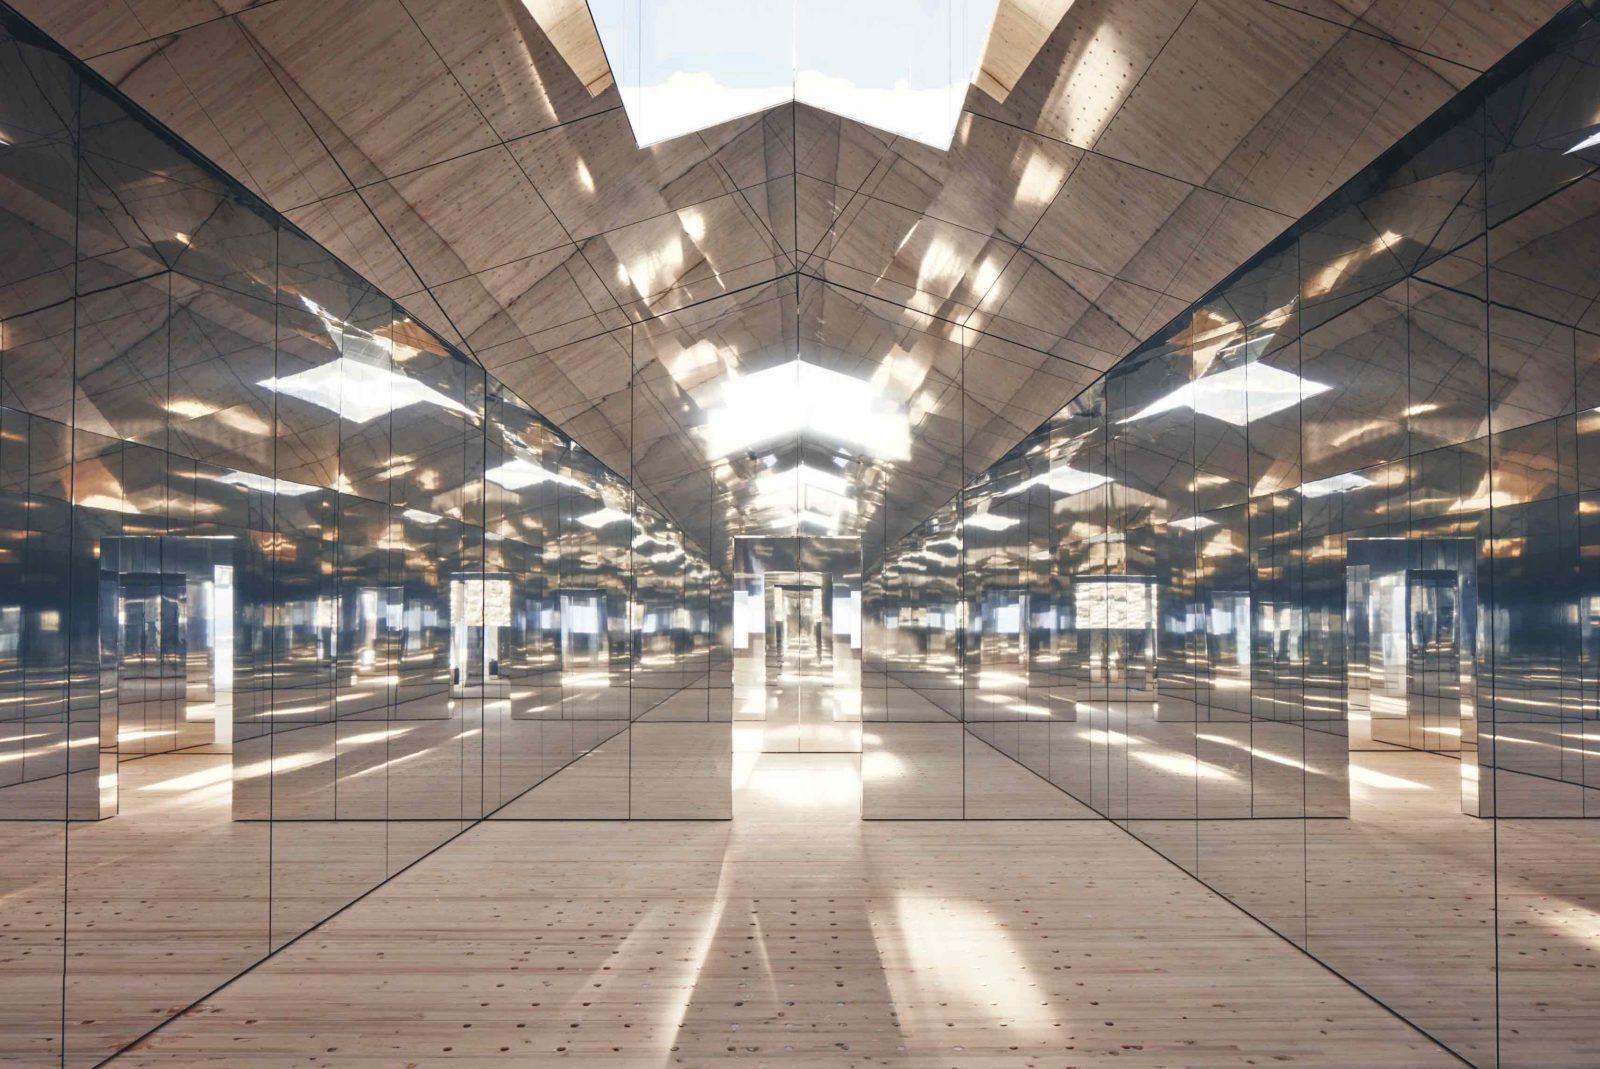 Mirage Gstaad Doug Aitken intérieur lumières